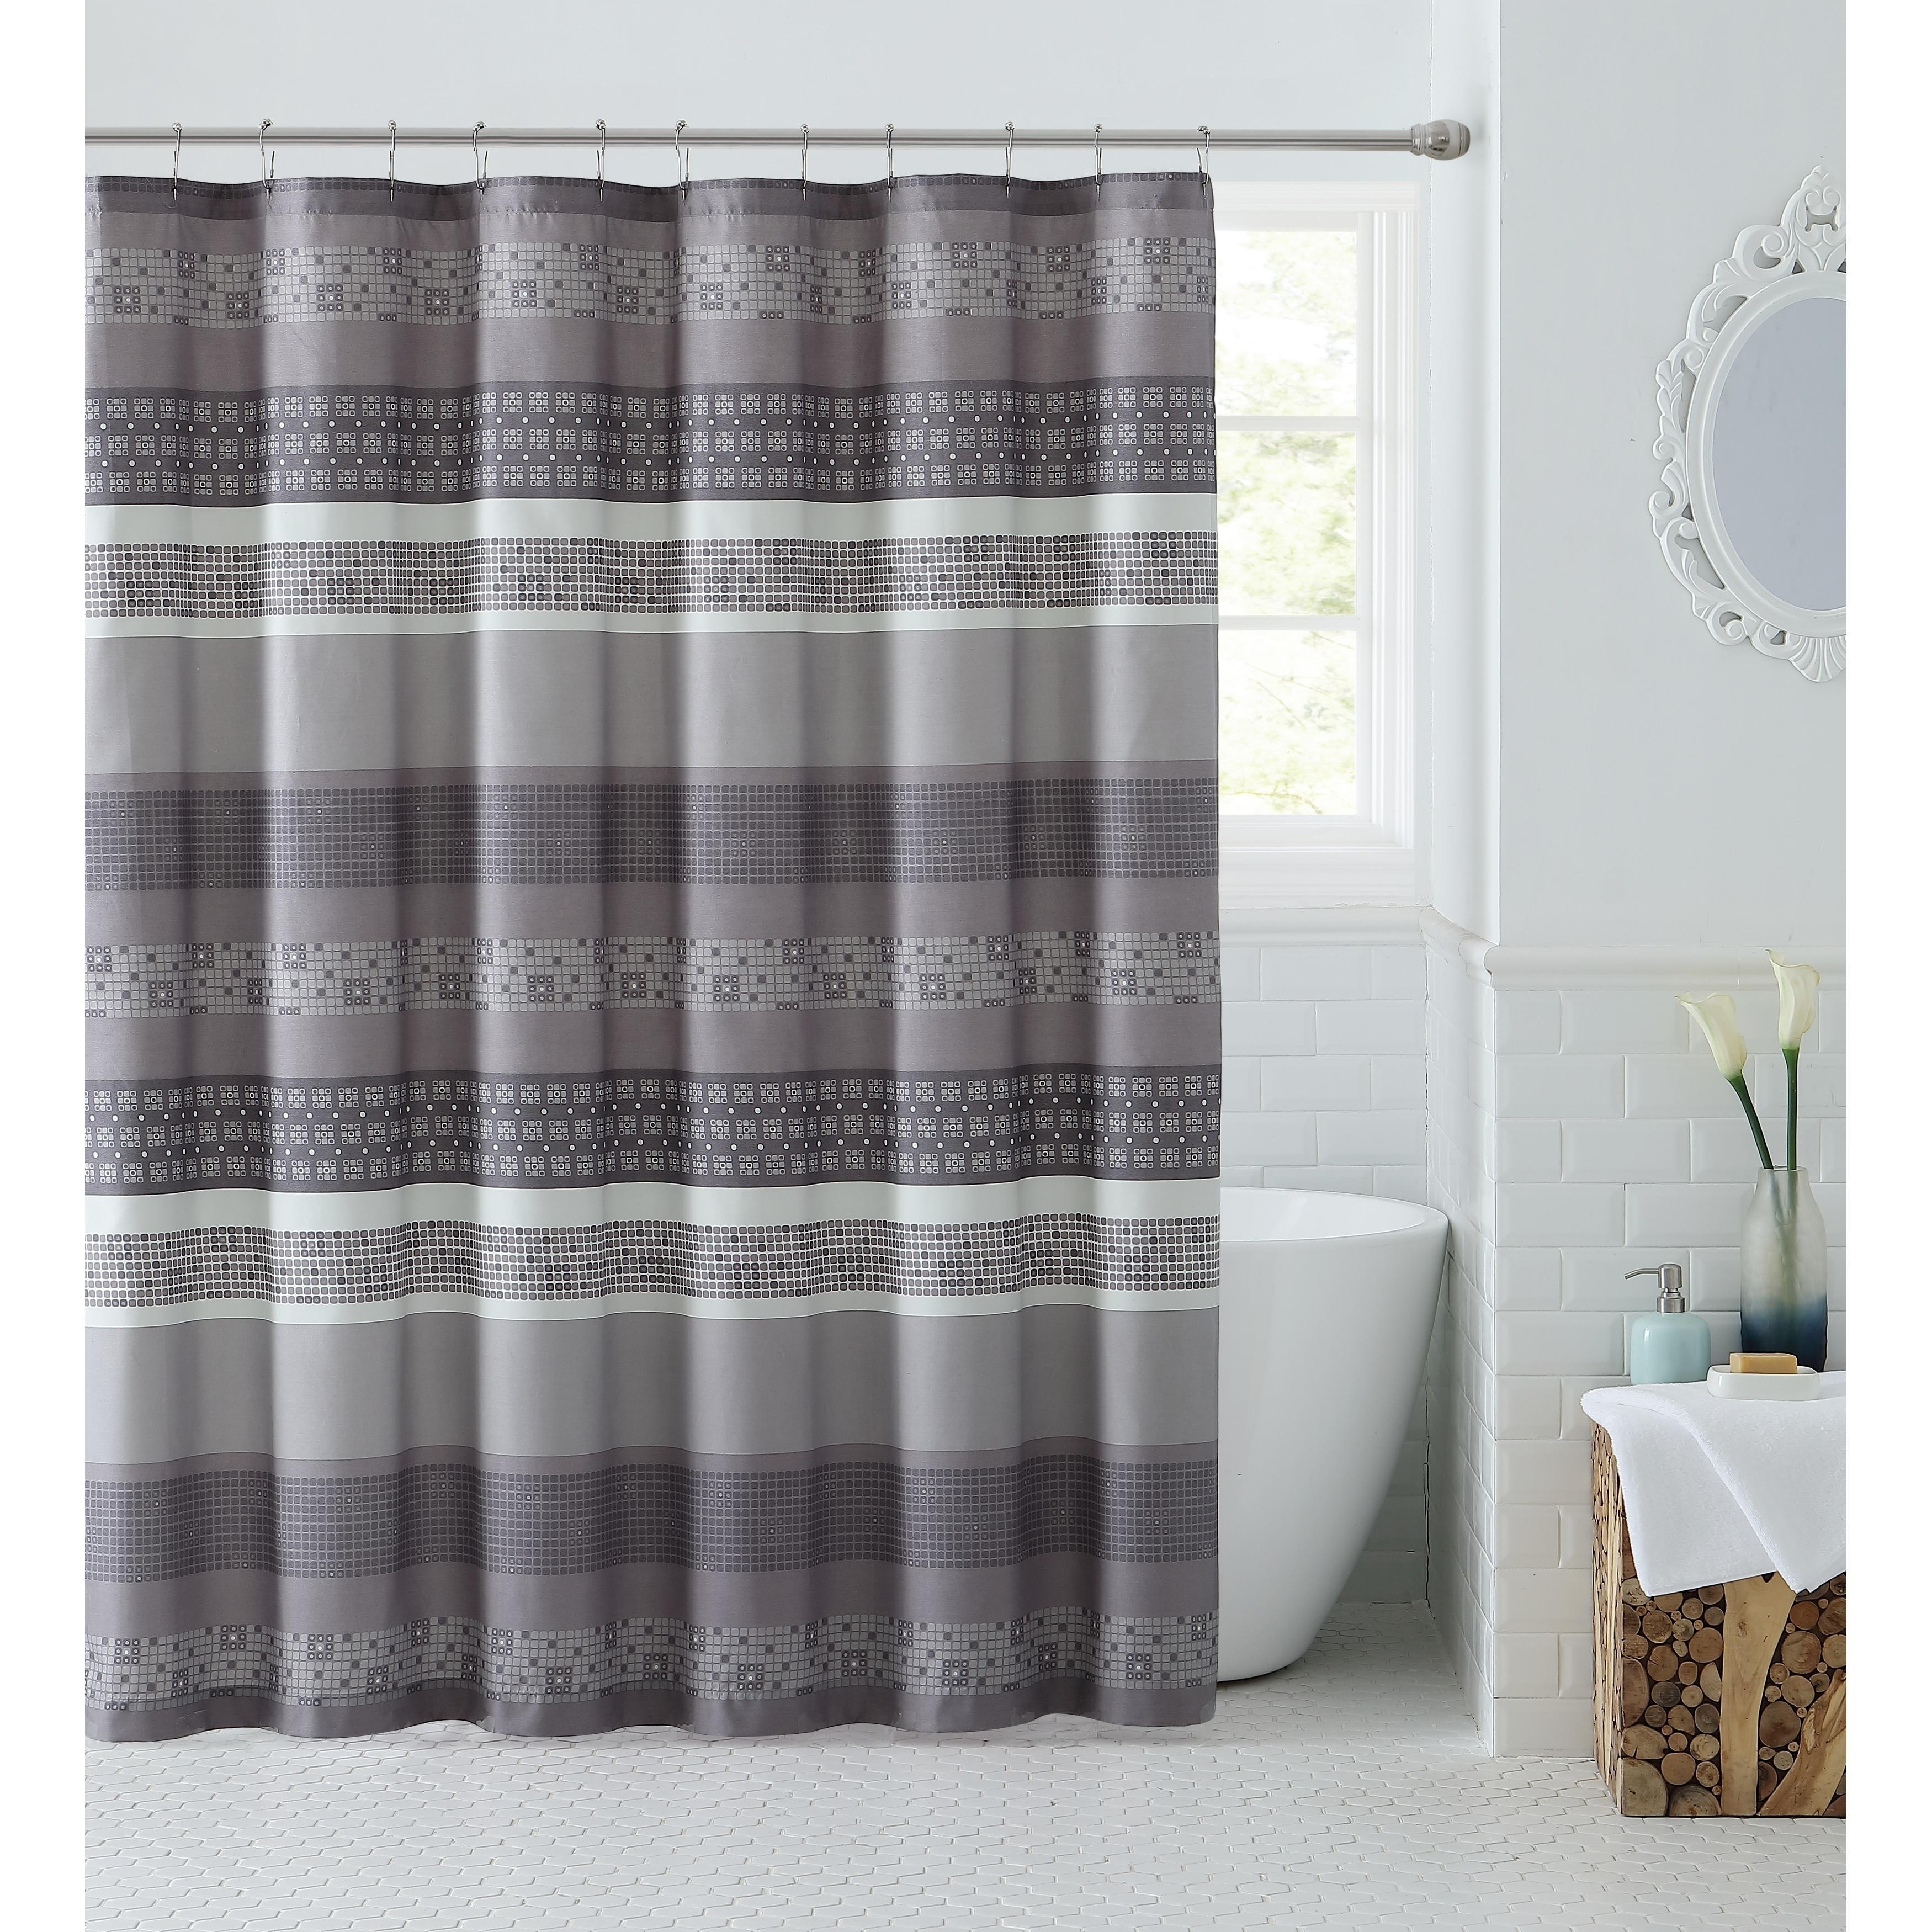 Vcny Home Casper Striped Shower Curtain